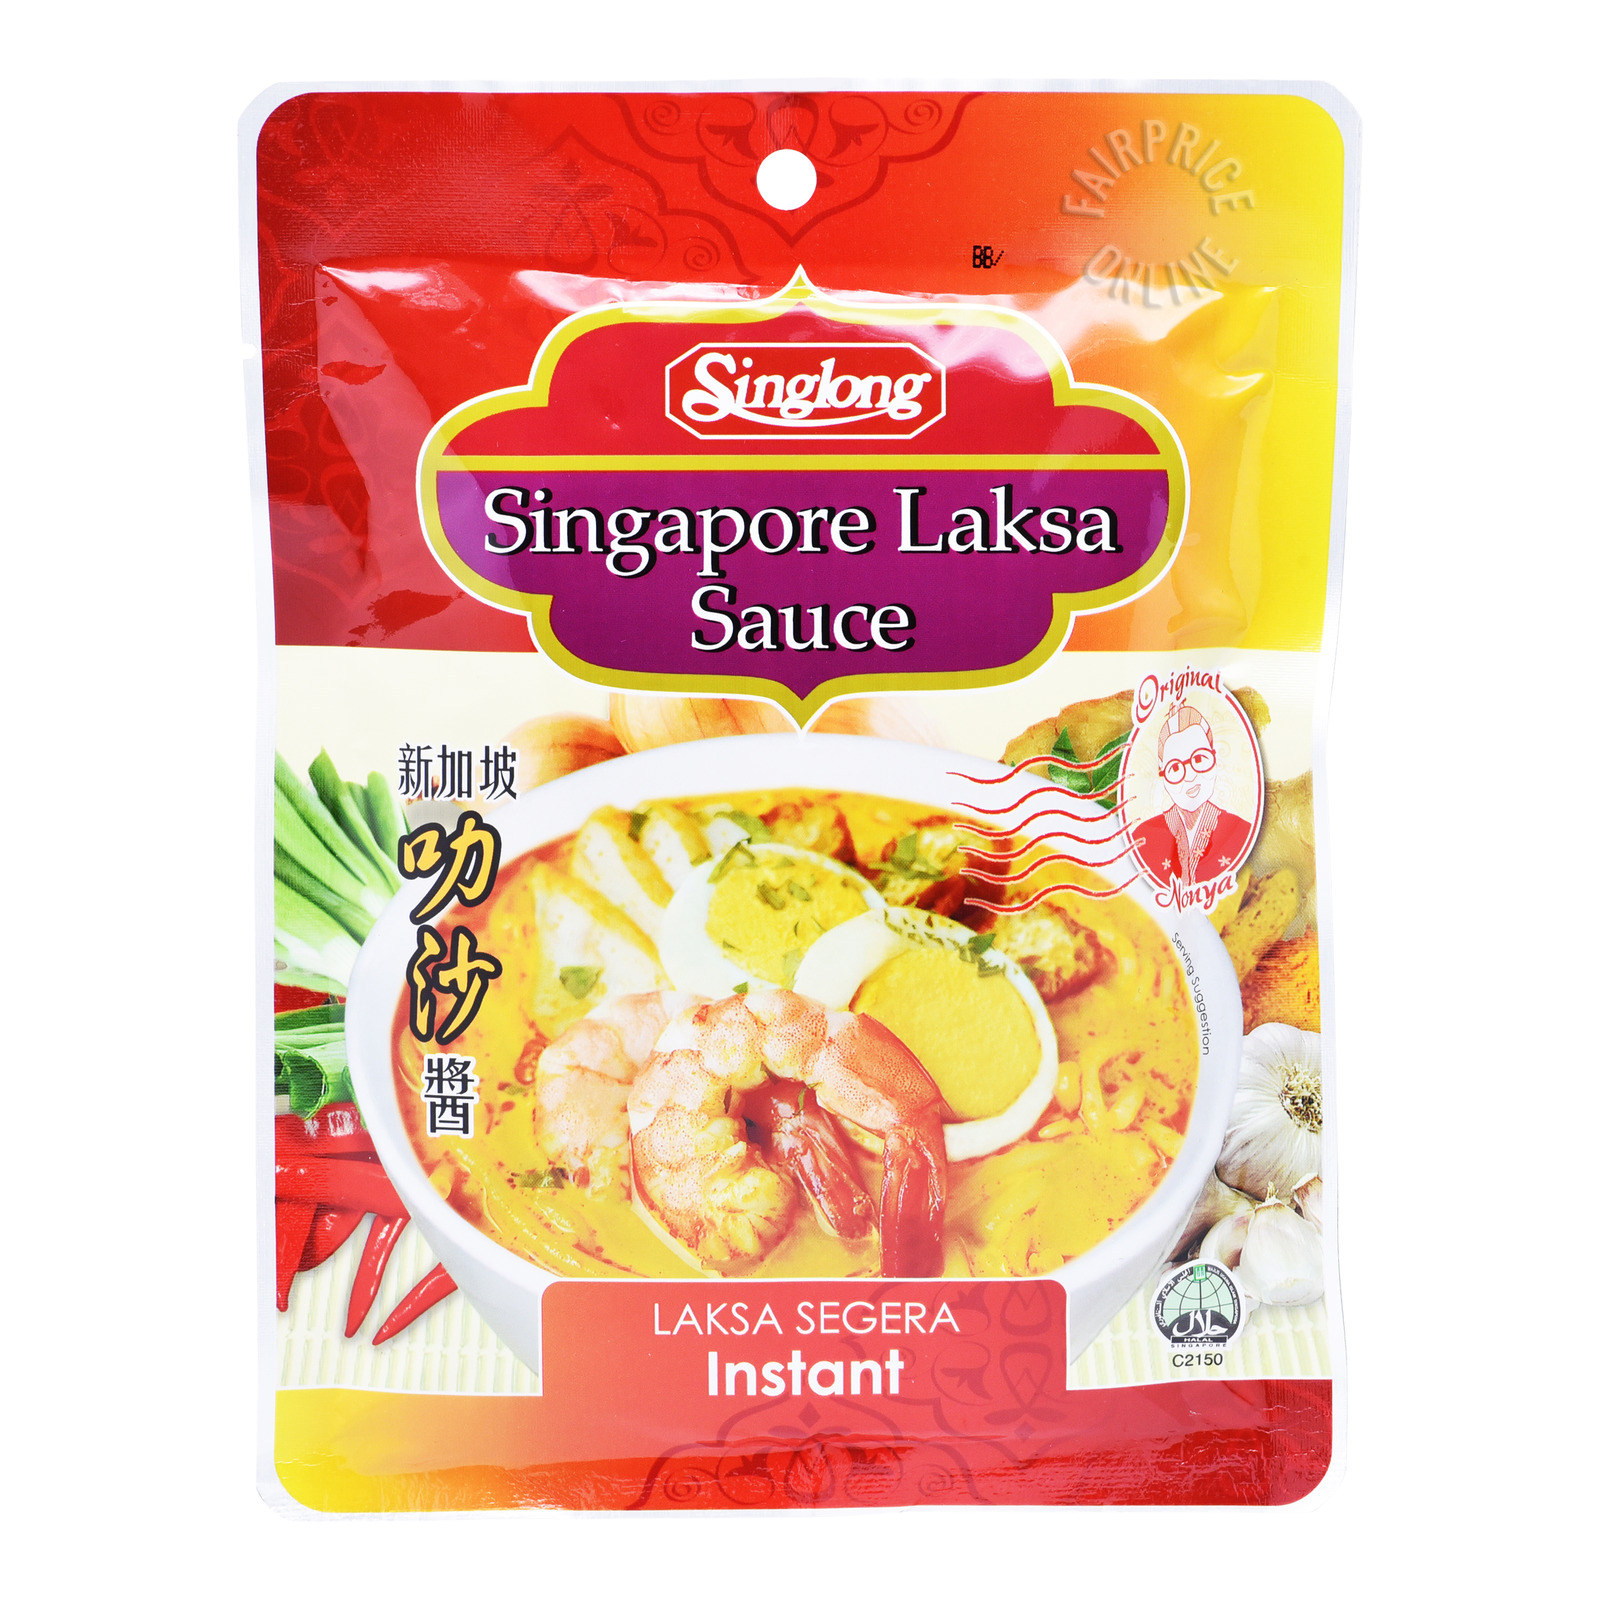 Sing Long Instant Sauce - Singapore Laksa